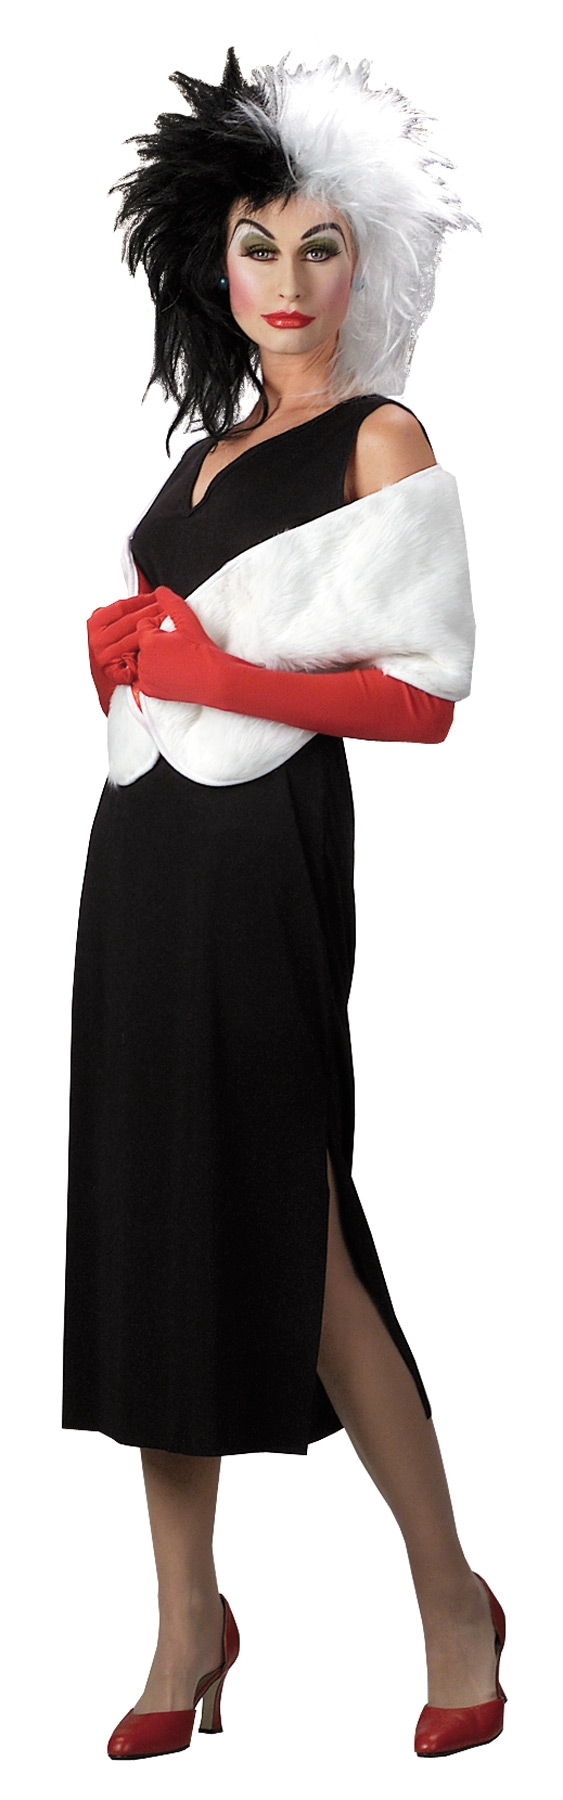 Костюм Круэллы (46-48) костюм радужной клоунессы 46 48